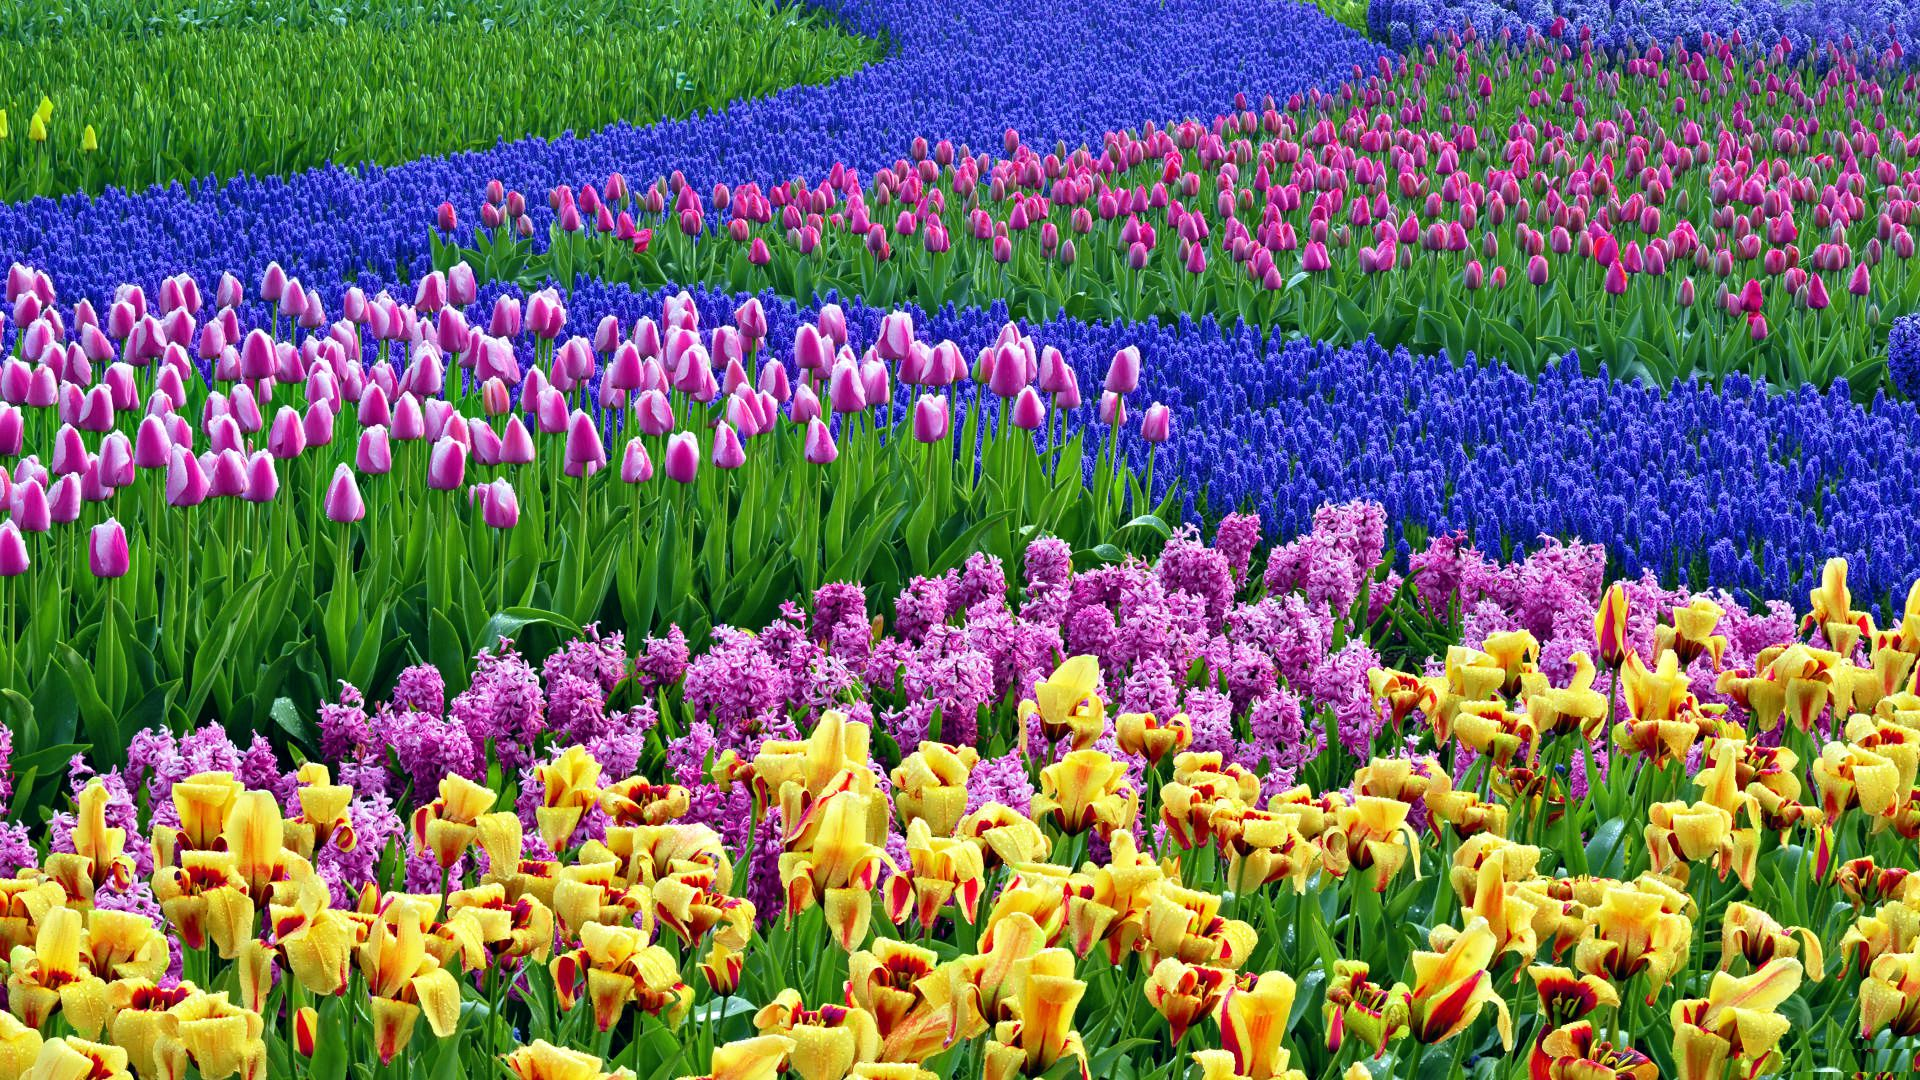 Spring Wallpapers Desktop High Quality - Spring Flowers Desktop Backgrounds , HD Wallpaper & Backgrounds